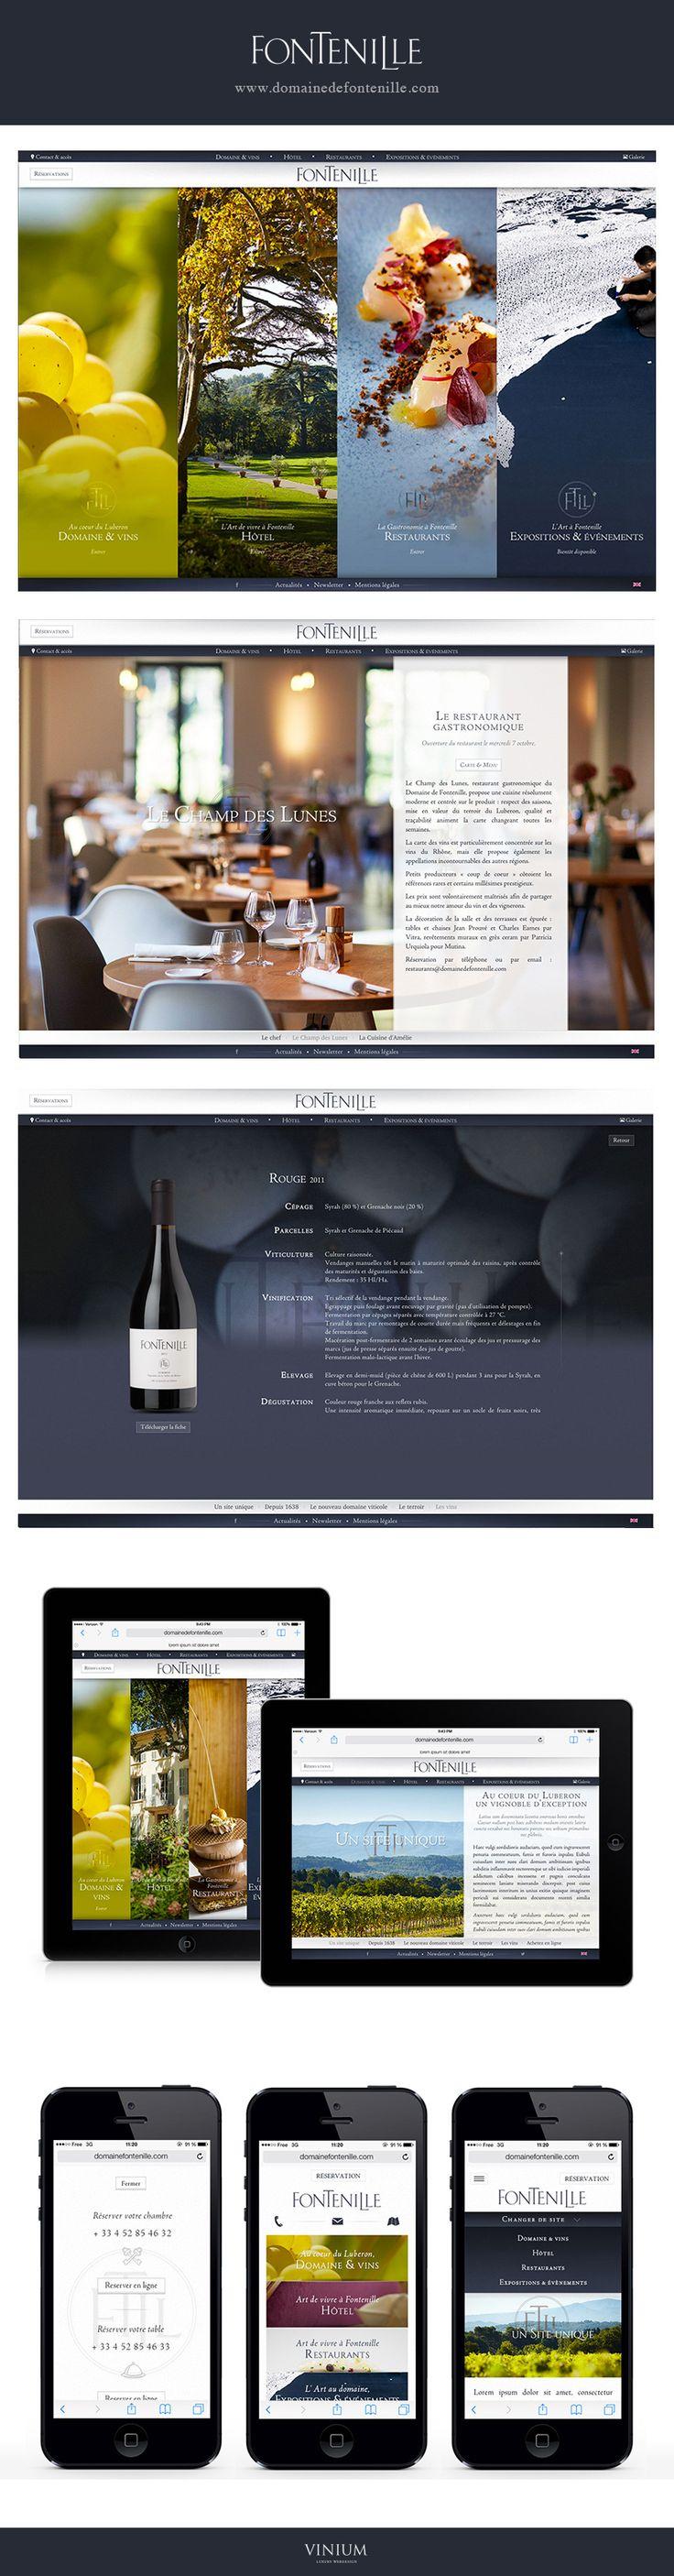 Fontenille www.domainedefontenille.com #webdesign #domaine #hotel #restaurant #gastronomie #luberon #provence #vin